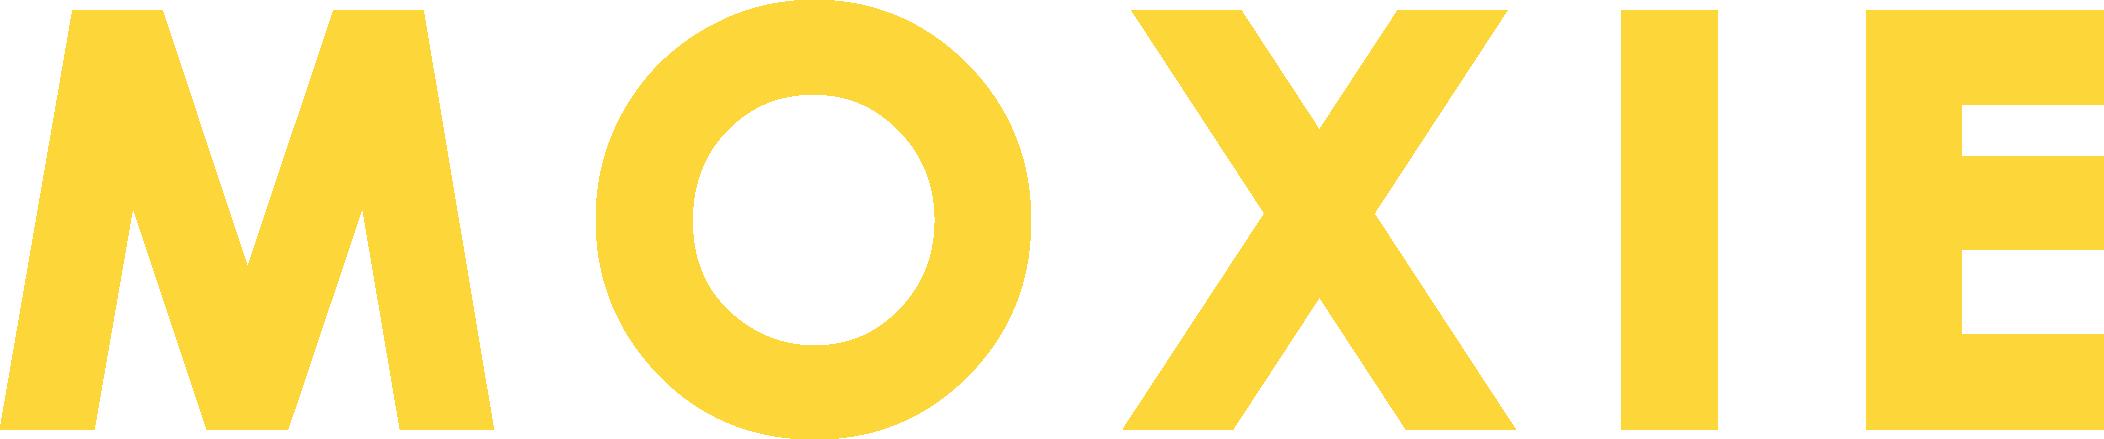 Moxie NYC Logo Yellow - Vector.png